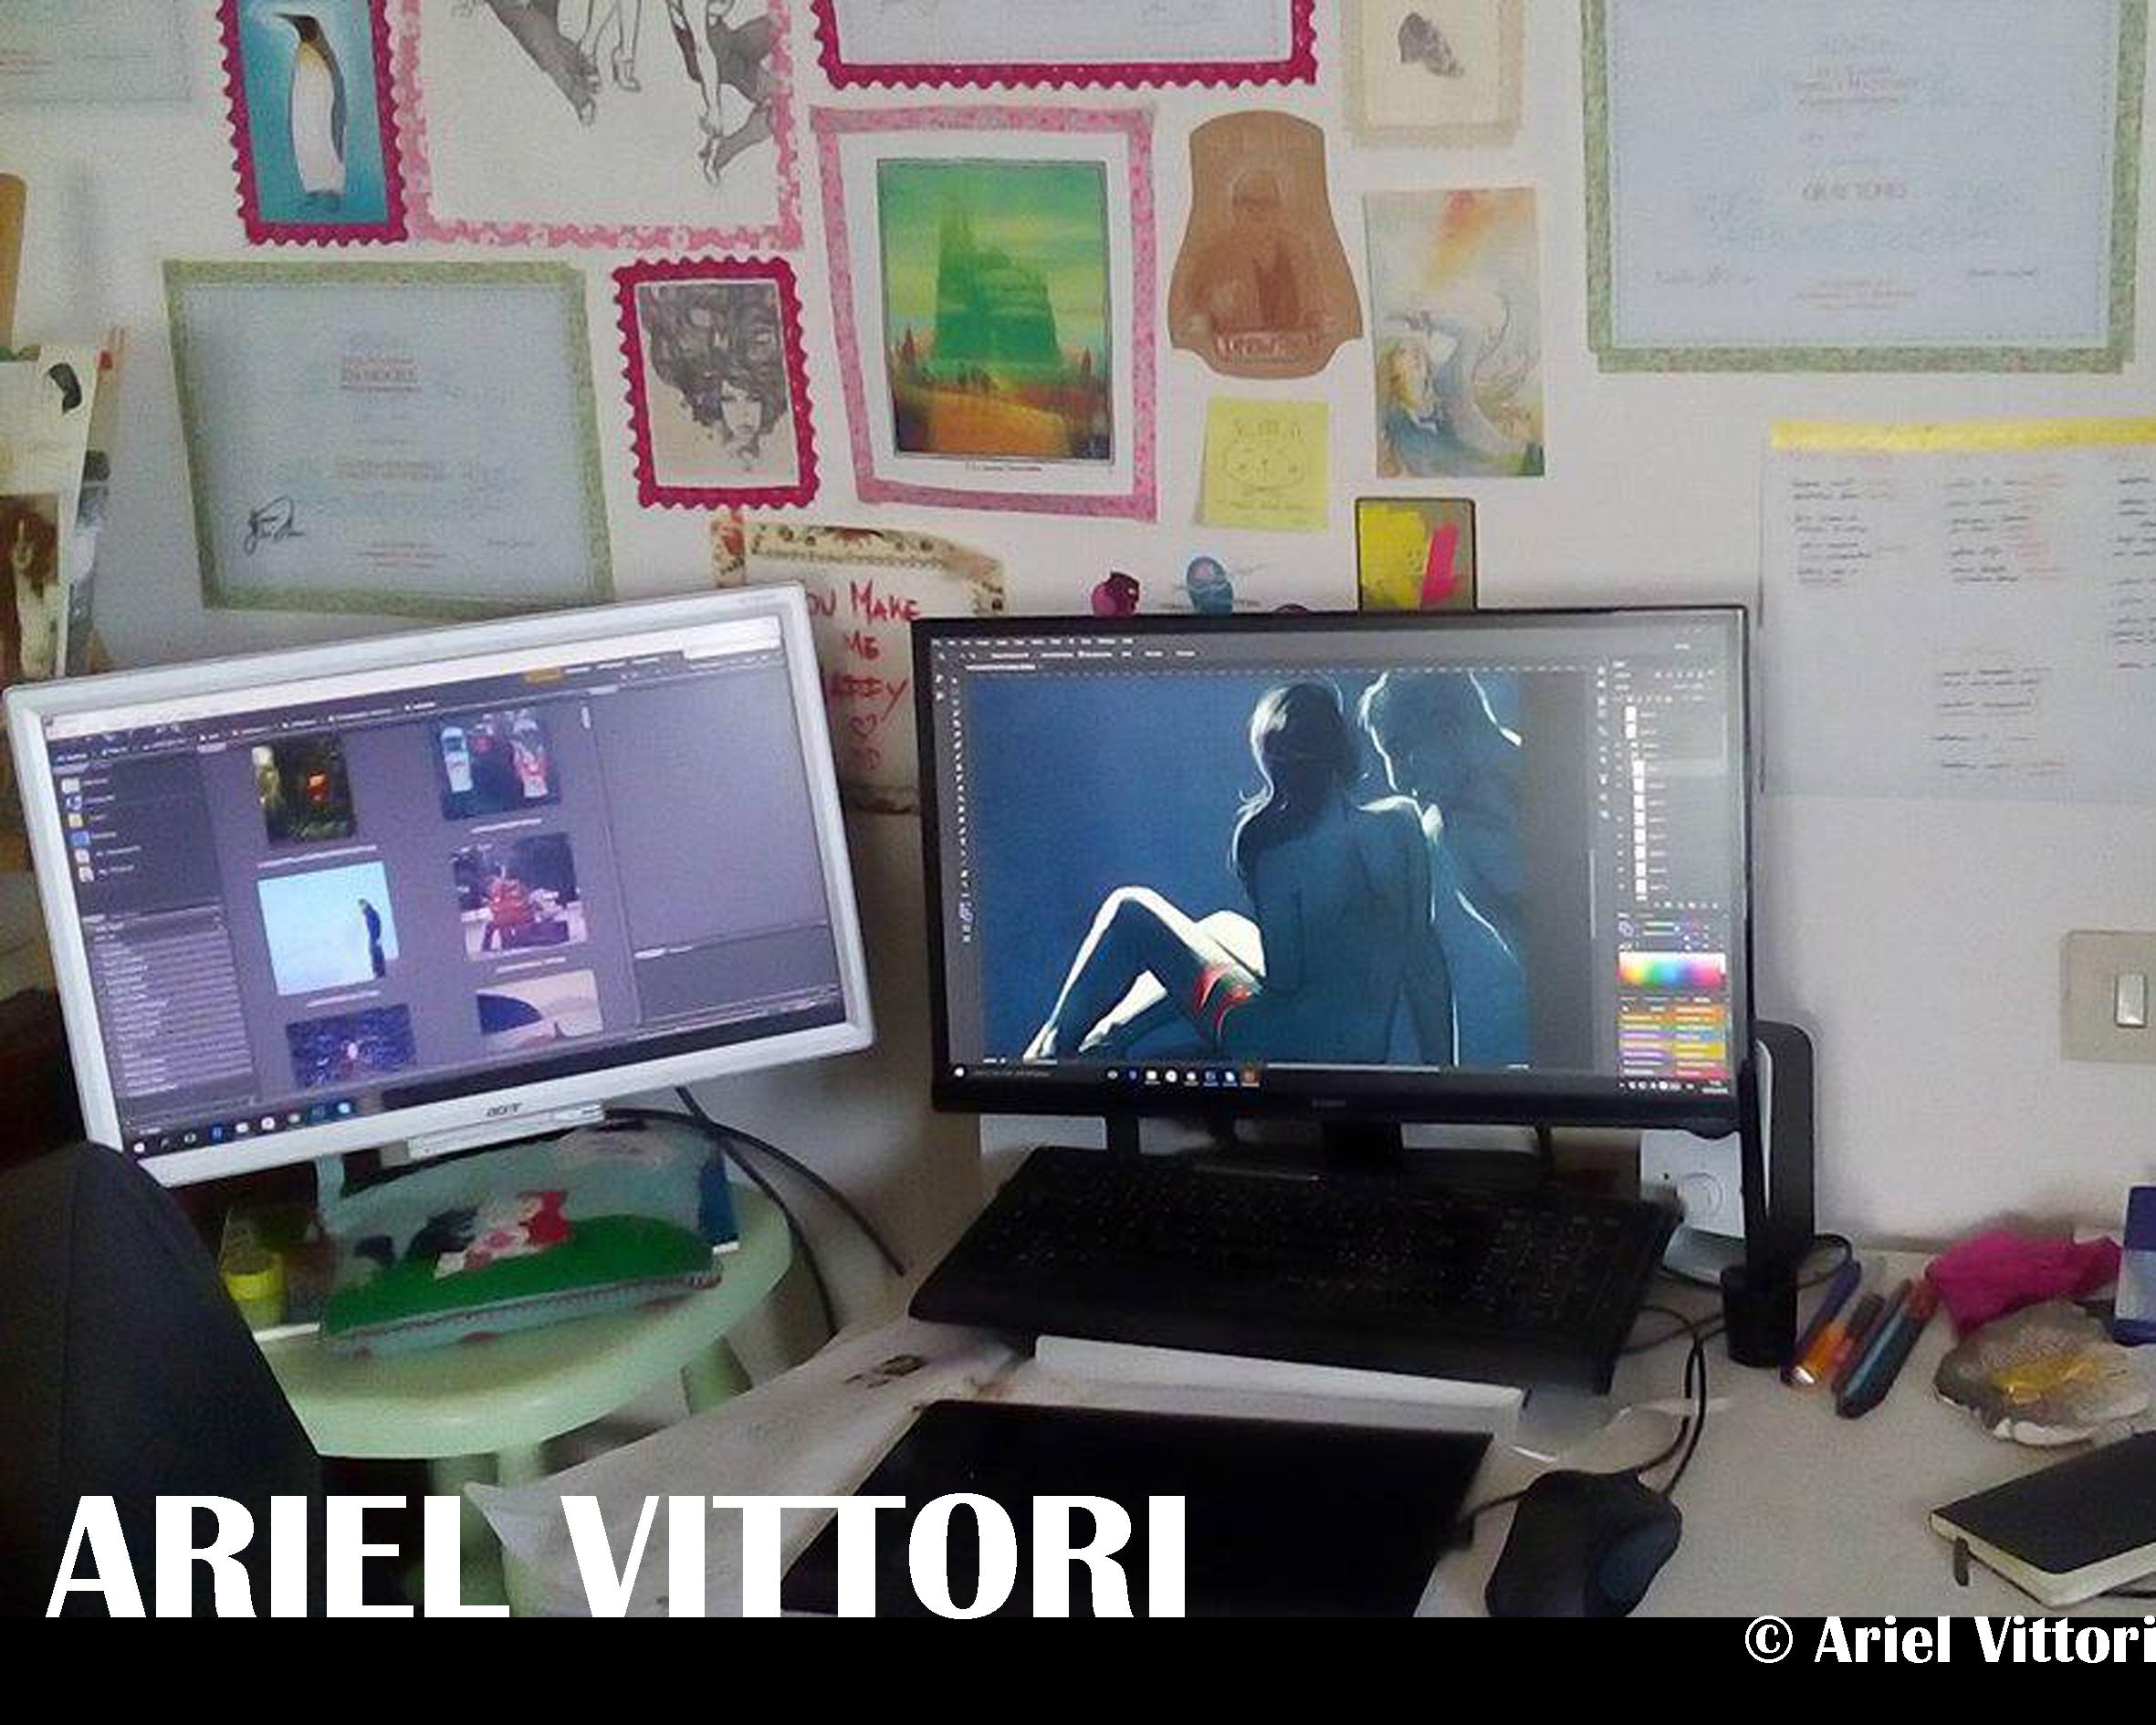 Ariel Vittori